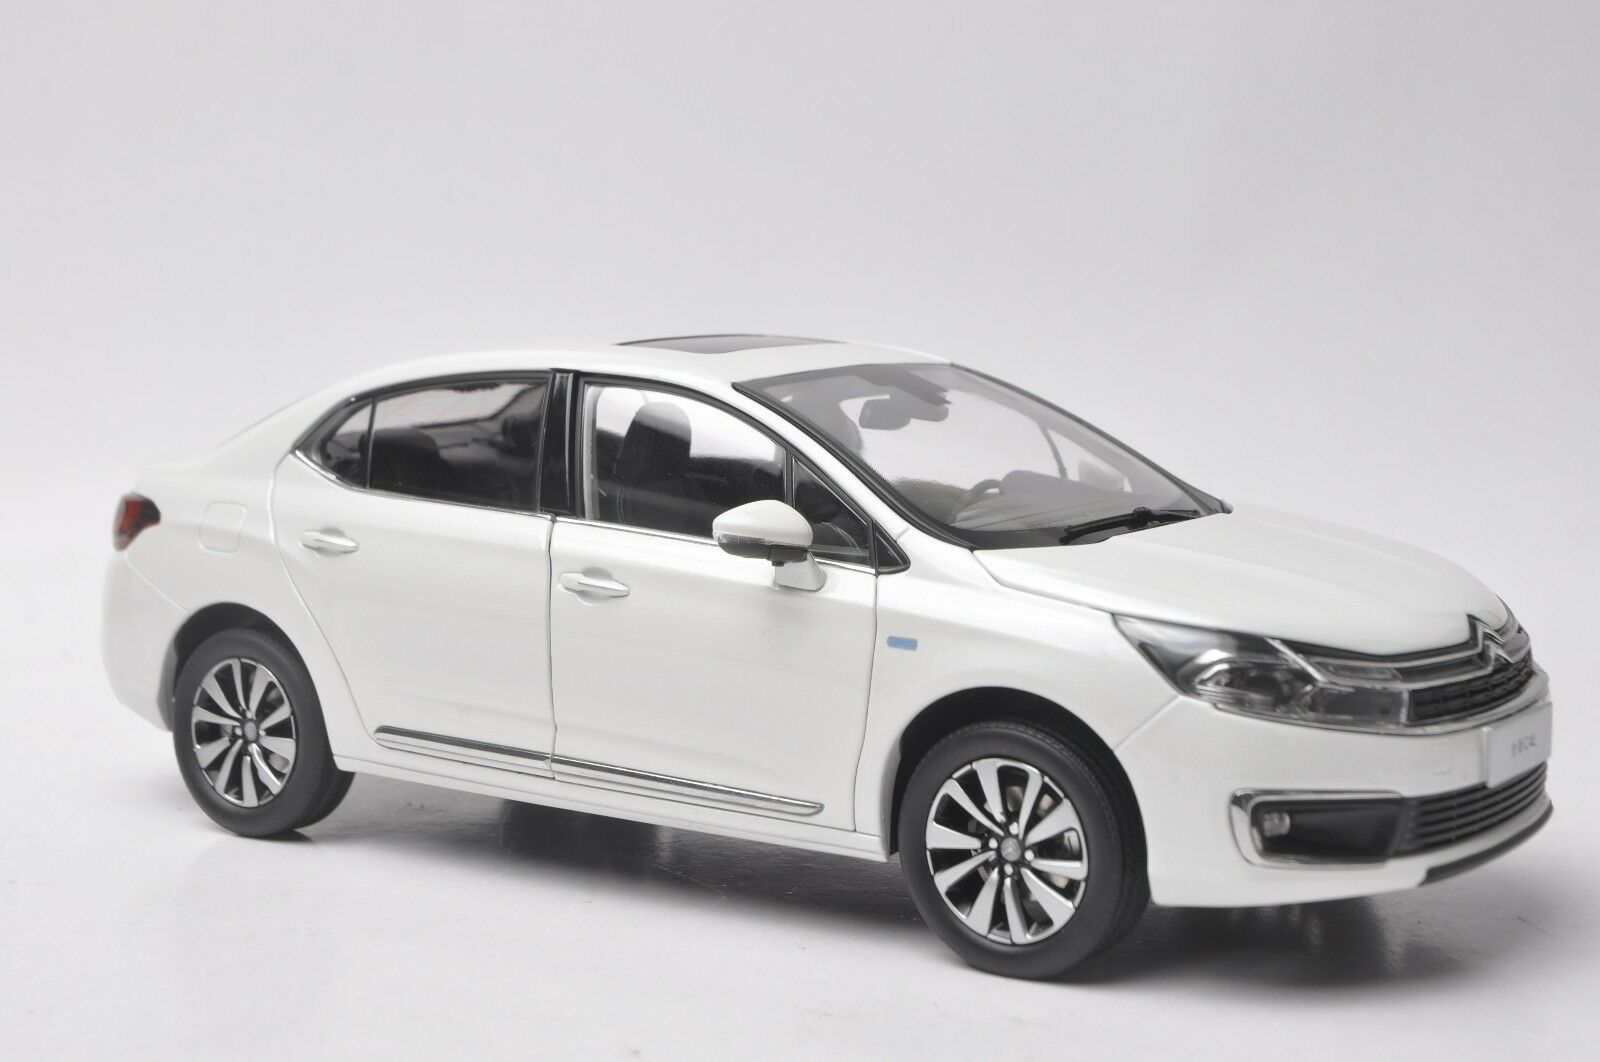 Citroen neue c4l auto modell im maßstab 1,18 Weiß